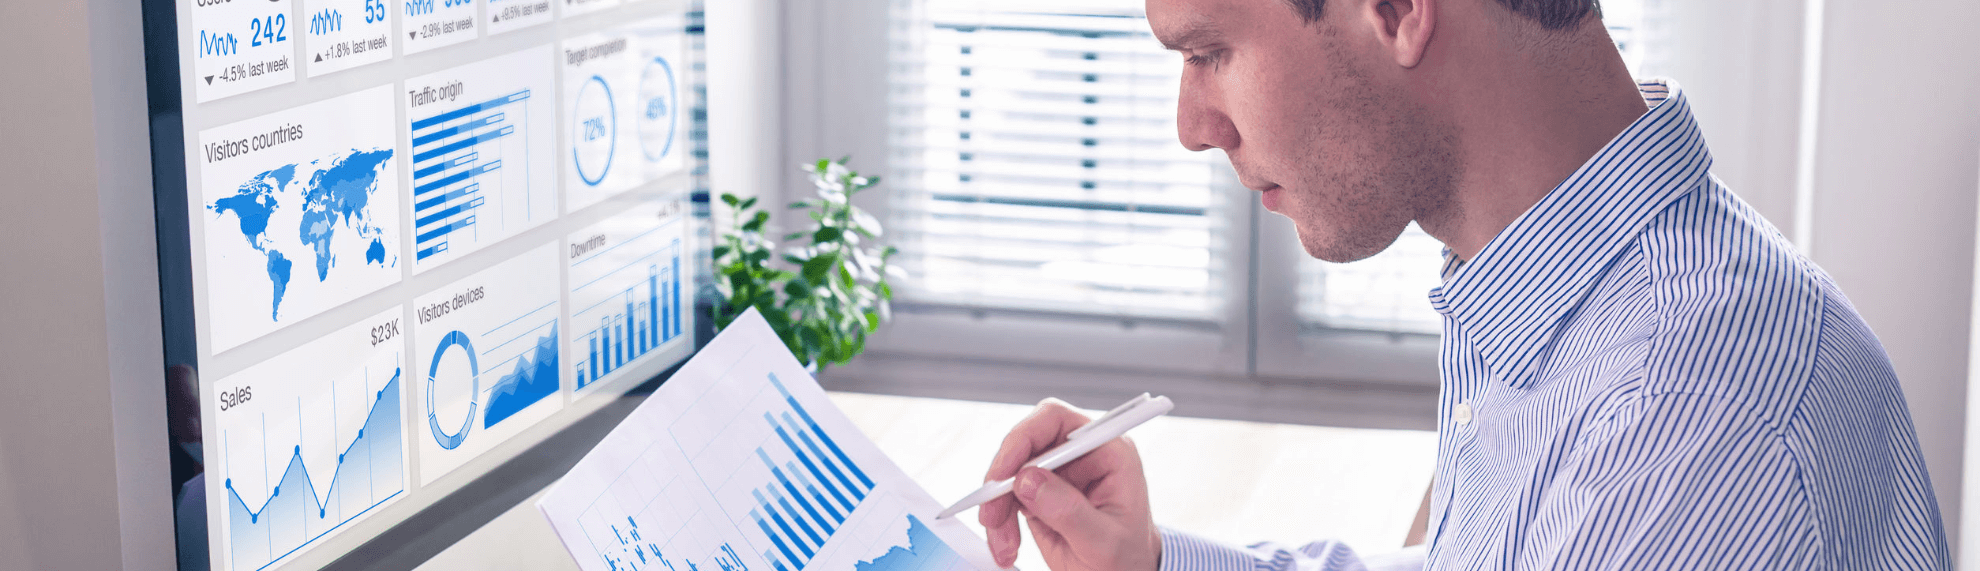 Mastersheet: Resultaat door Inzicht in Data. BI consultant, kpi, performance management, business intelligence, Qlik, PowerBI, Tableau